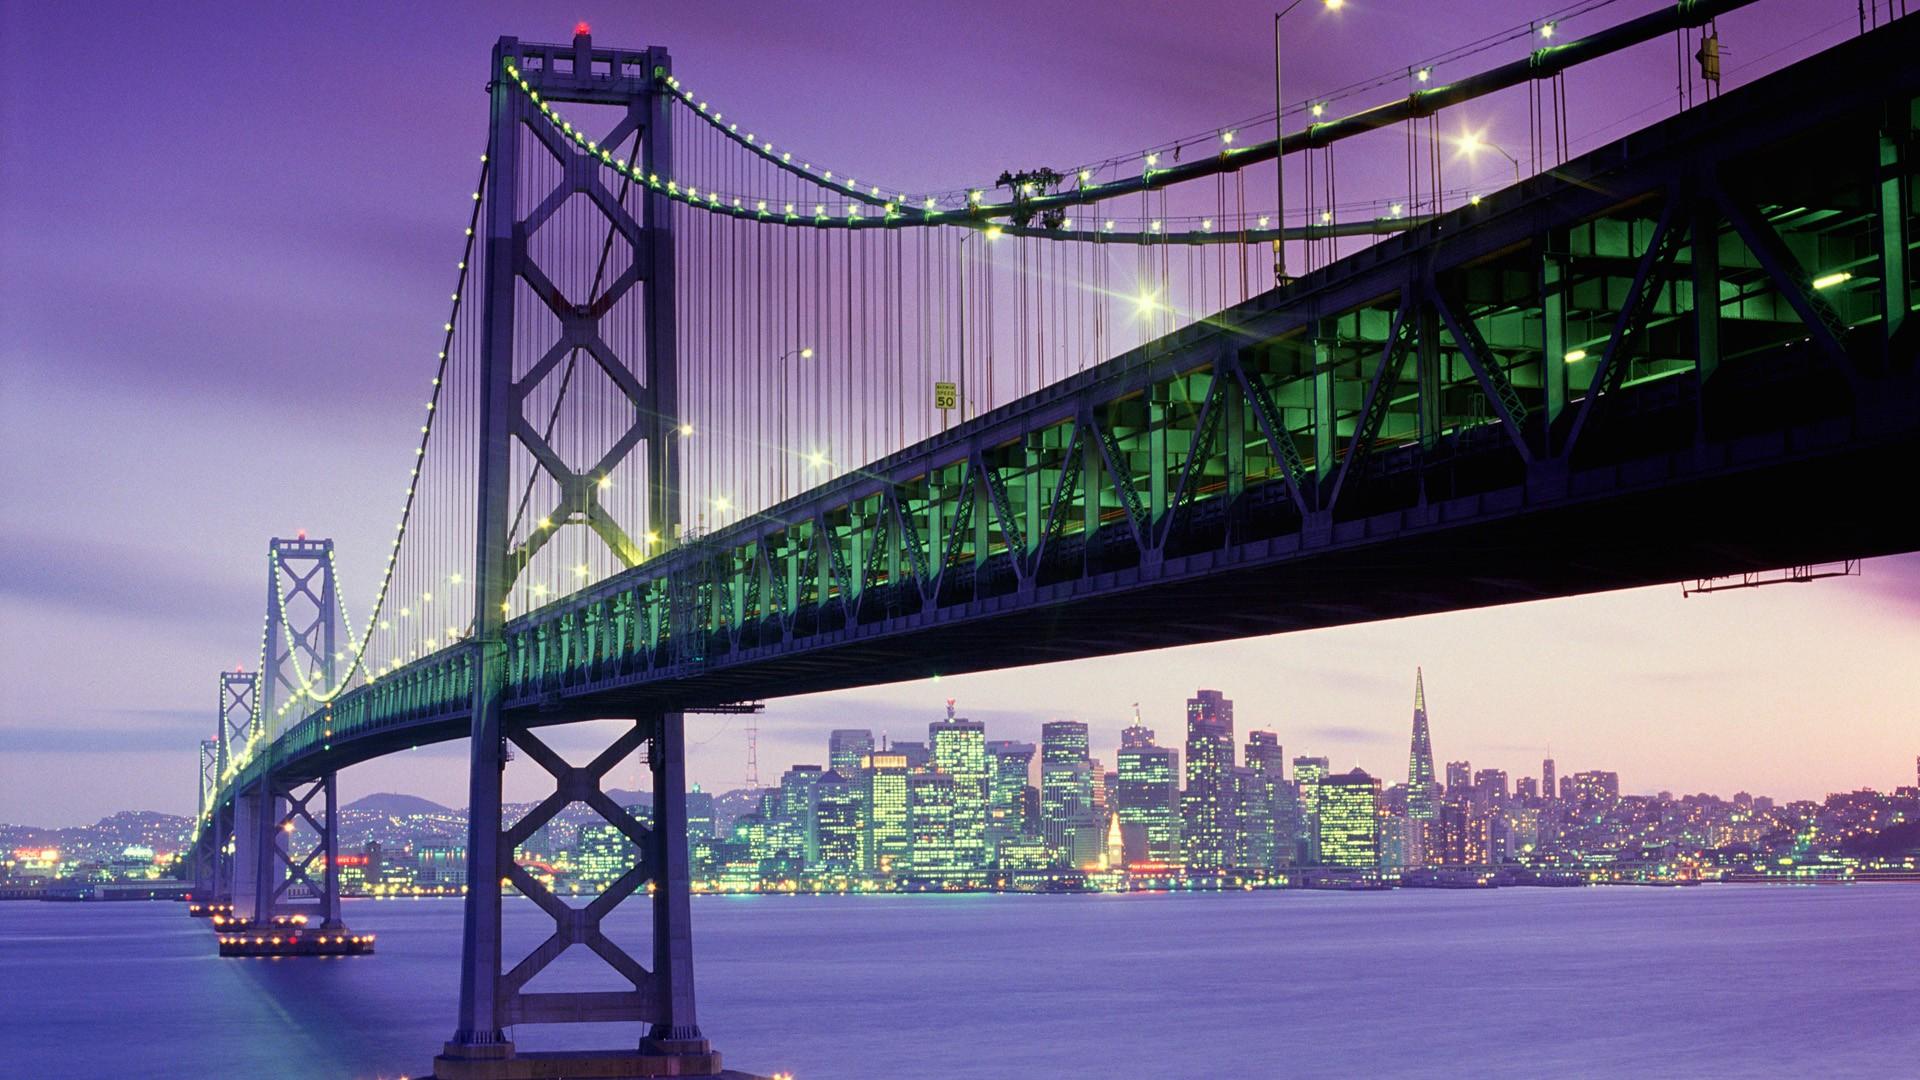 Bridge: Bridge, Light, City, Man Made, Dusk